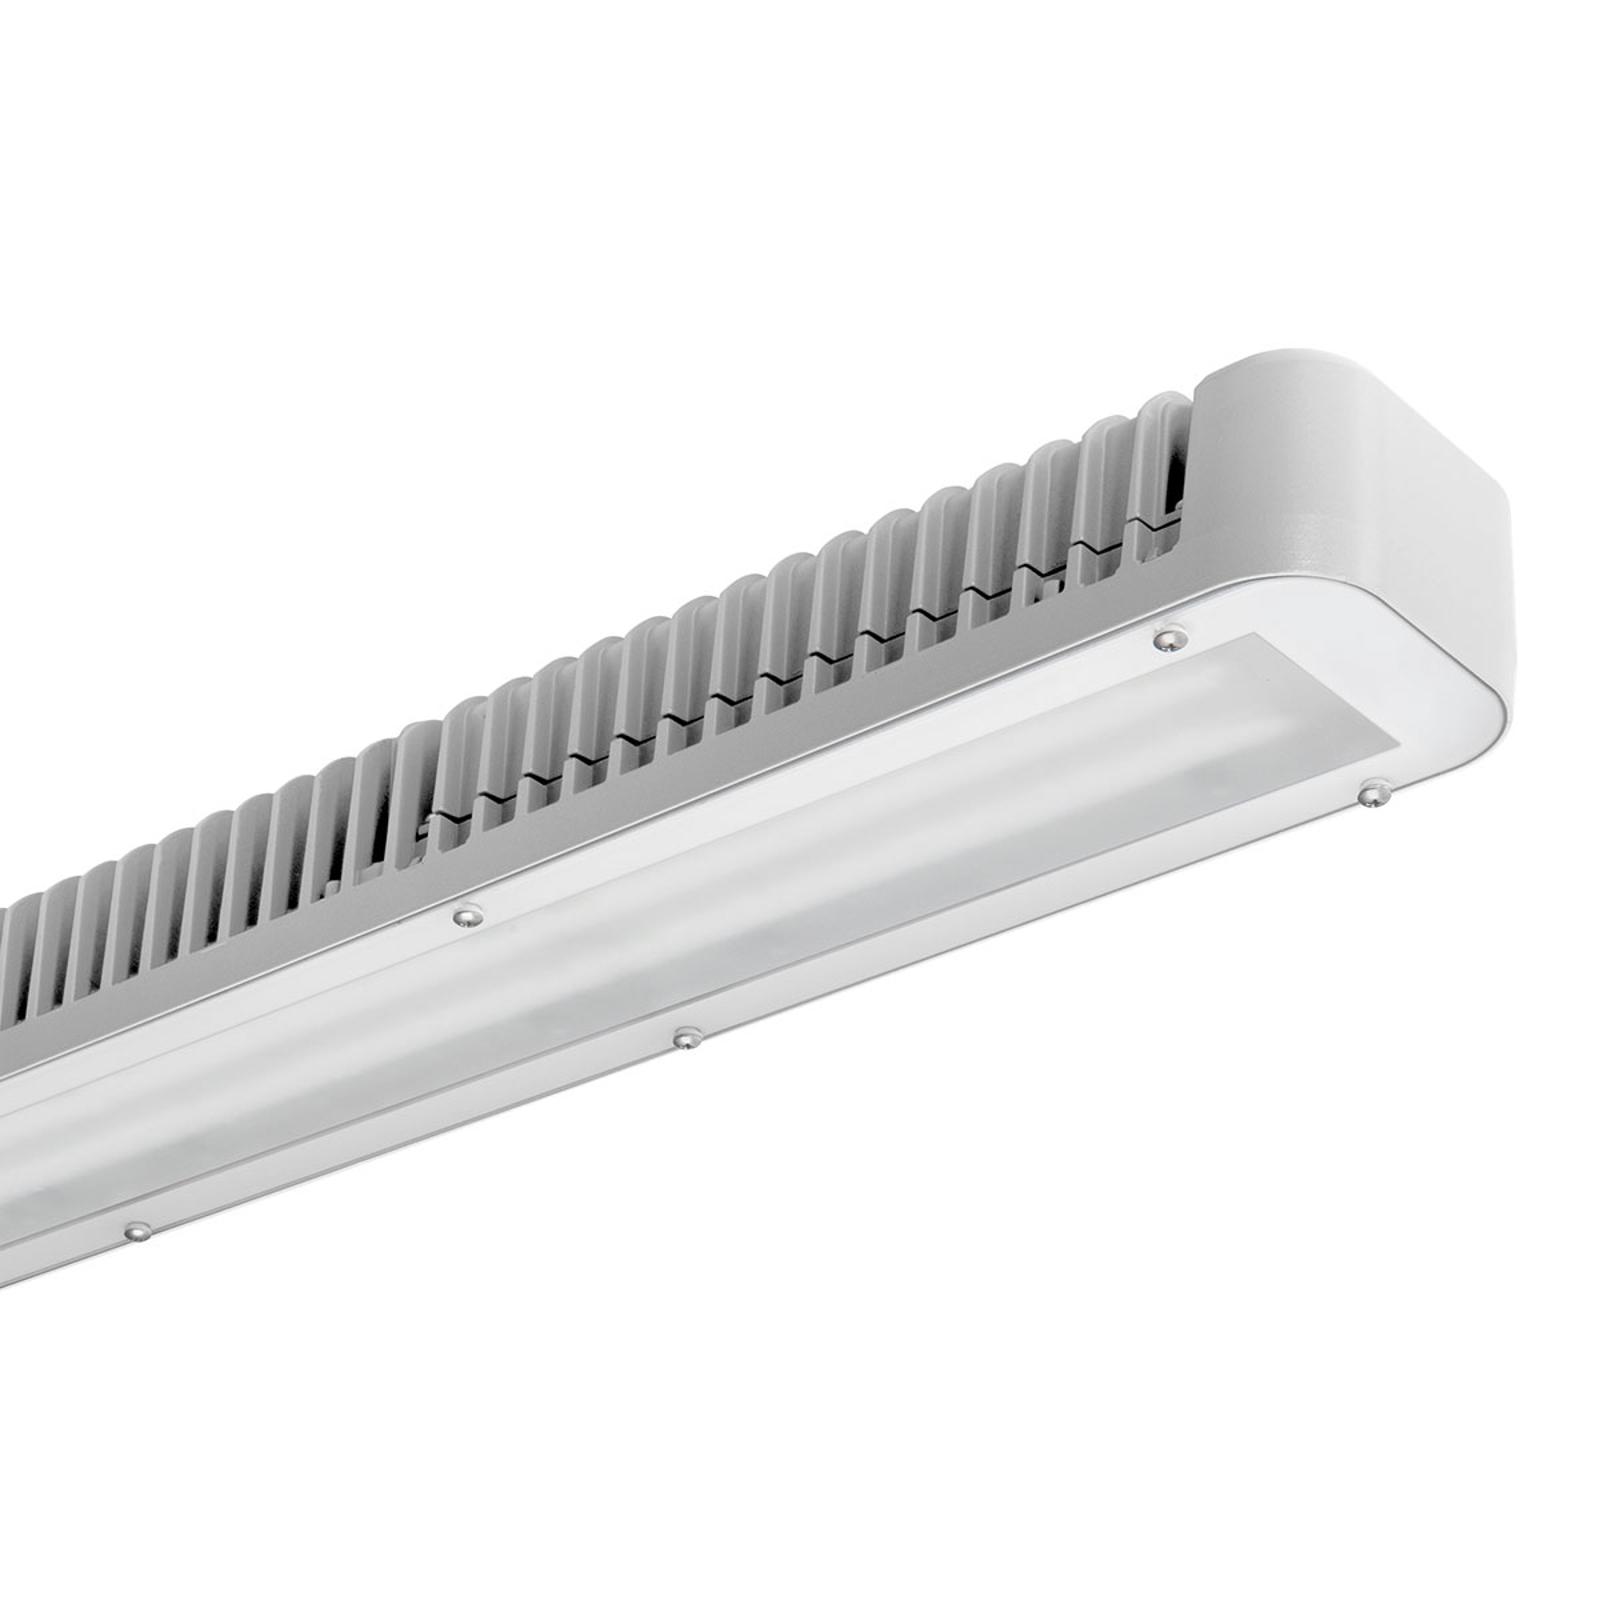 Lampa sufitowa LED Koa Line STR/GL S/EW 56W